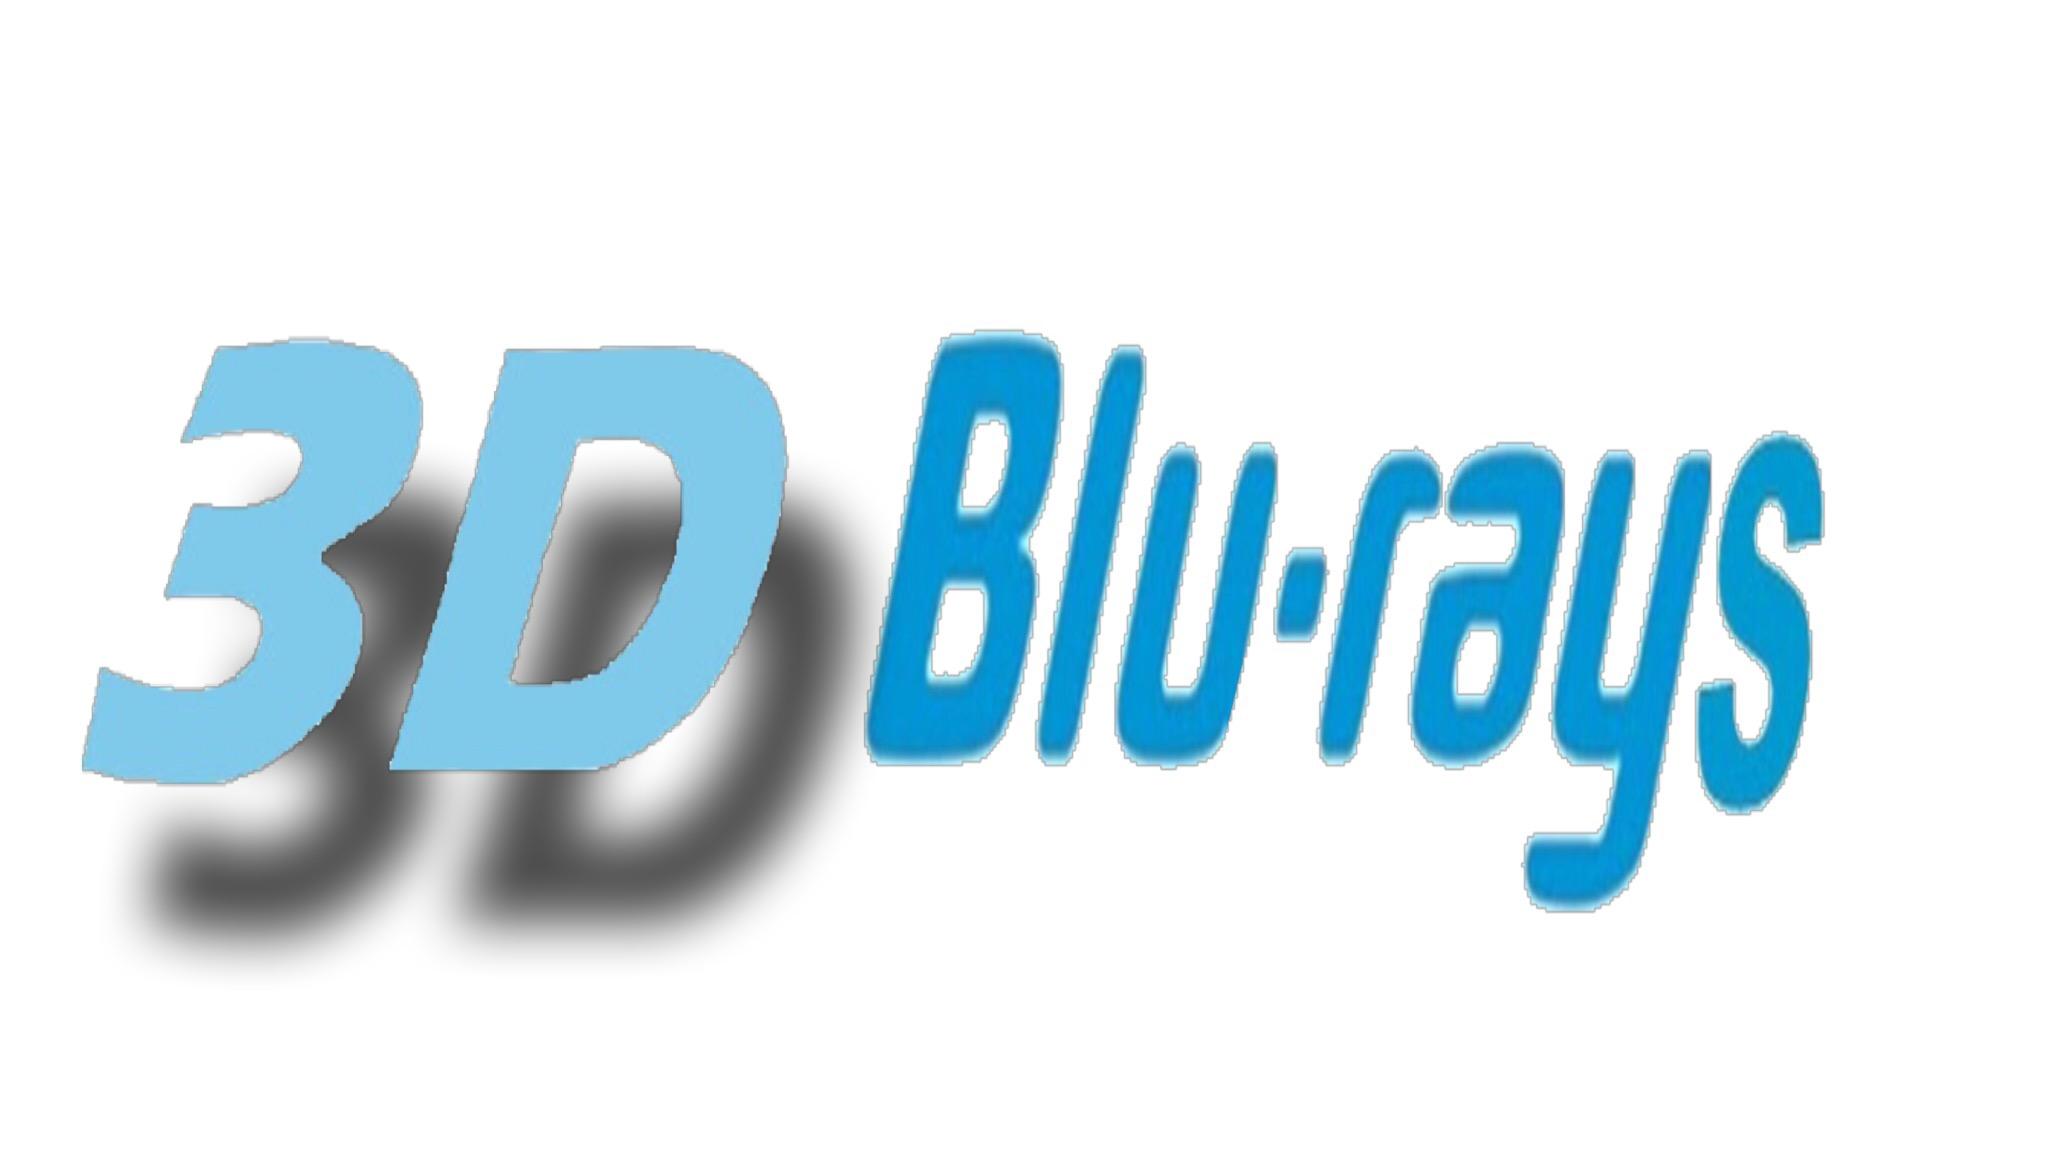 3D-3-D-blu-rays-blurays.JPG